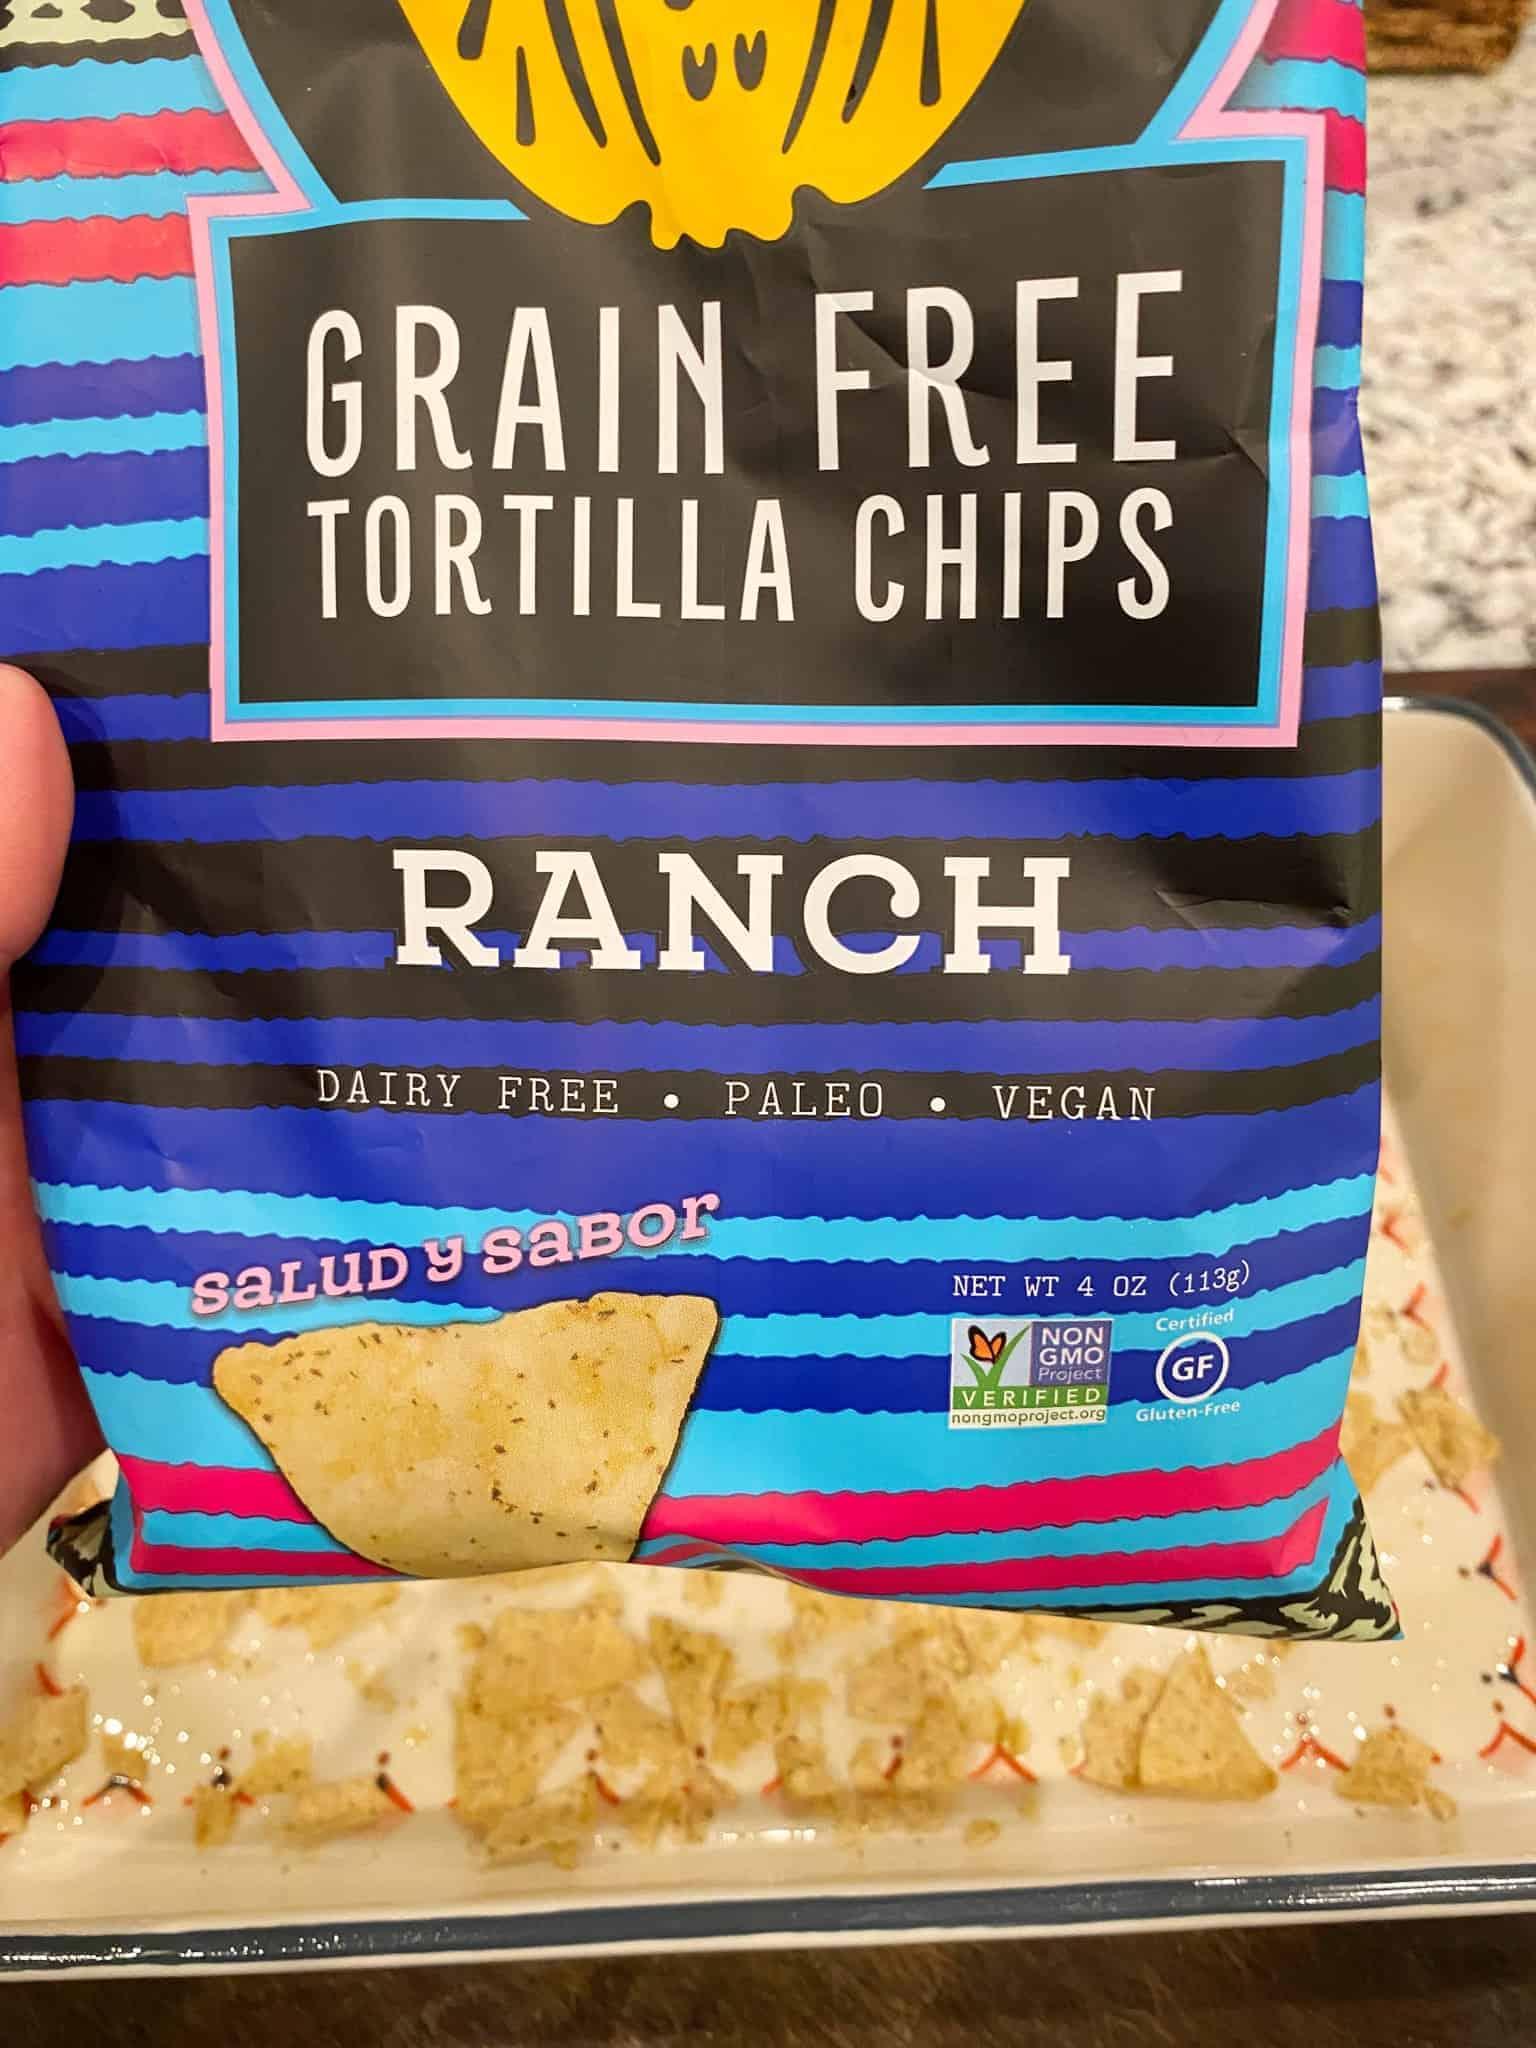 Taco-Casserole-Weight-Watchers-siete-low-carb-tortilla-chips